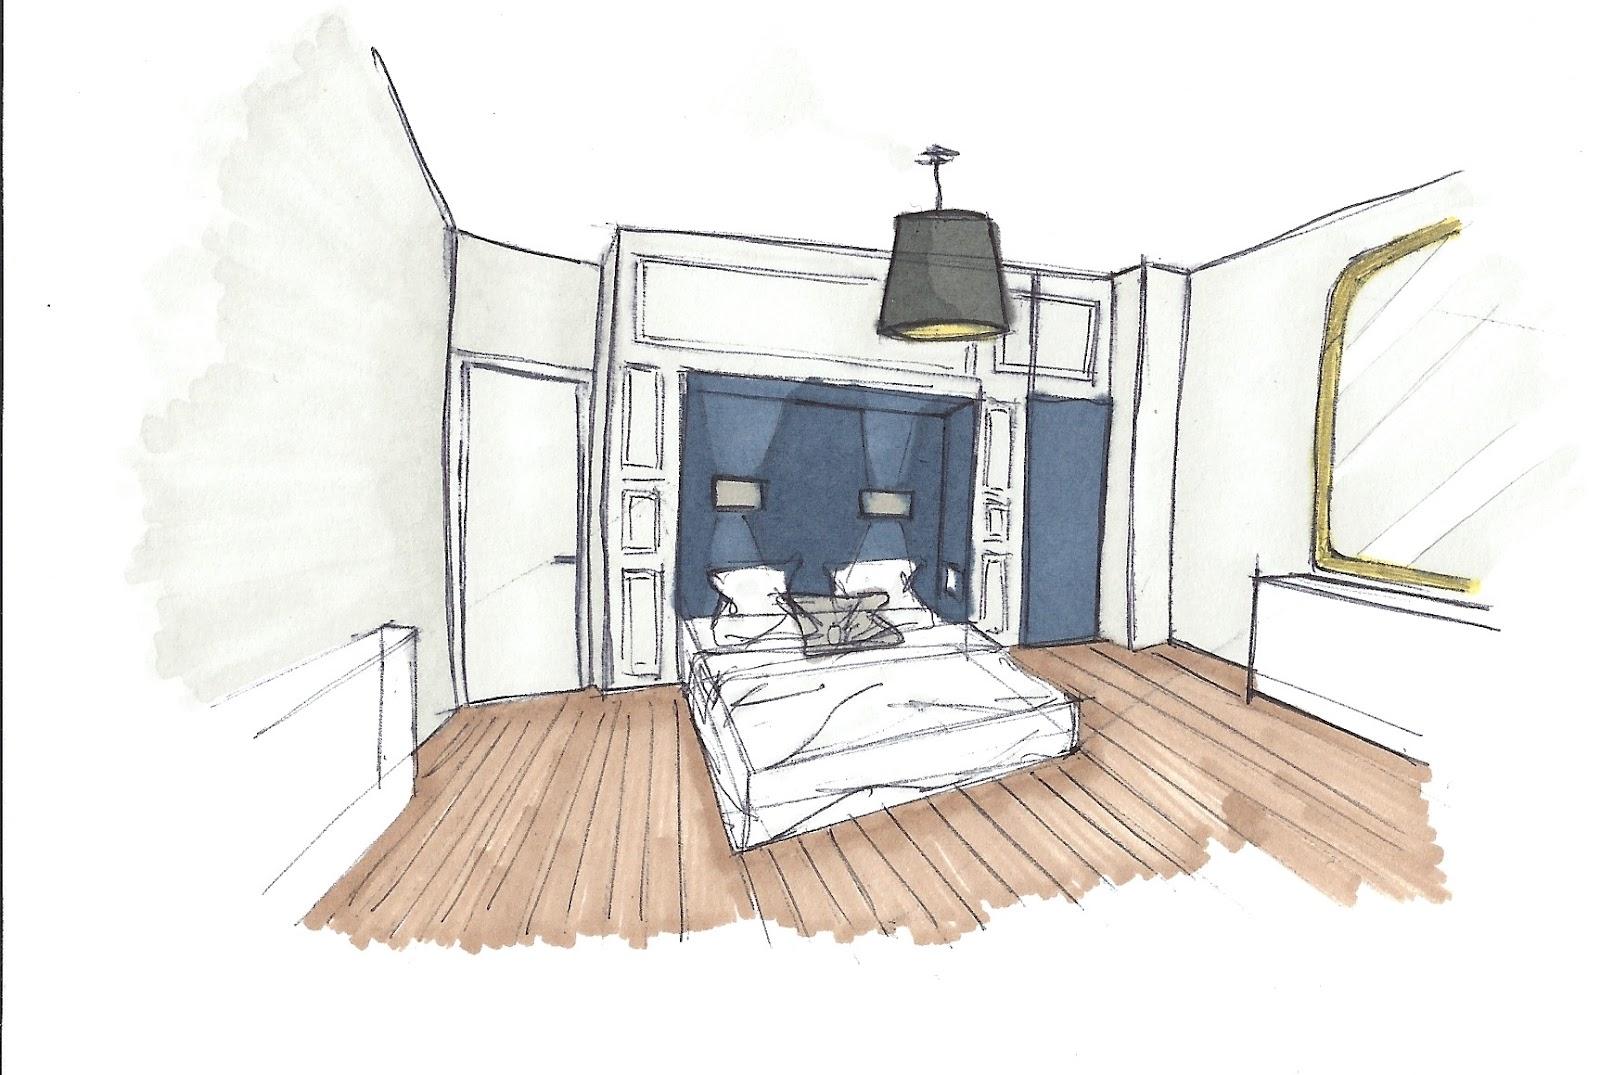 Chambre En Perspective Cavaliere | Great La Notion De Perspective ...